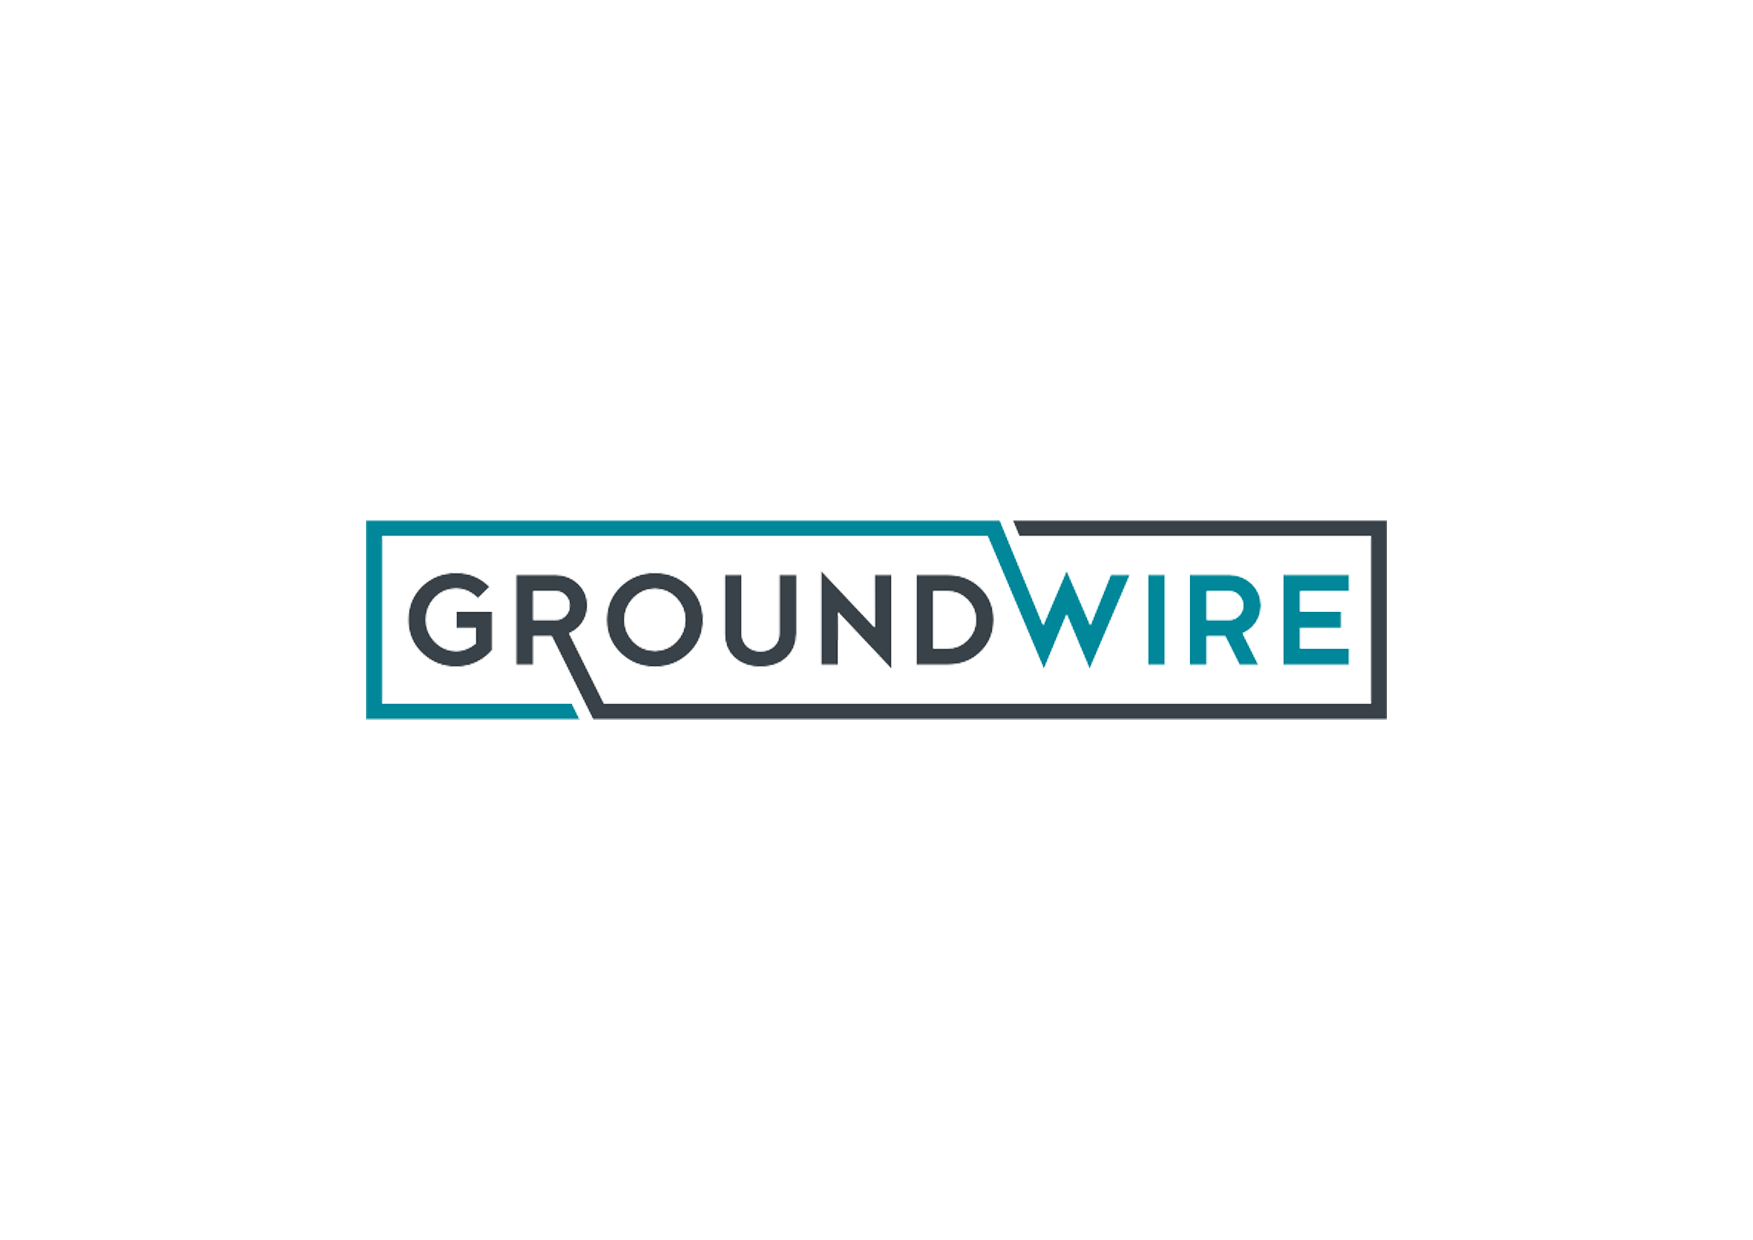 Groundwire